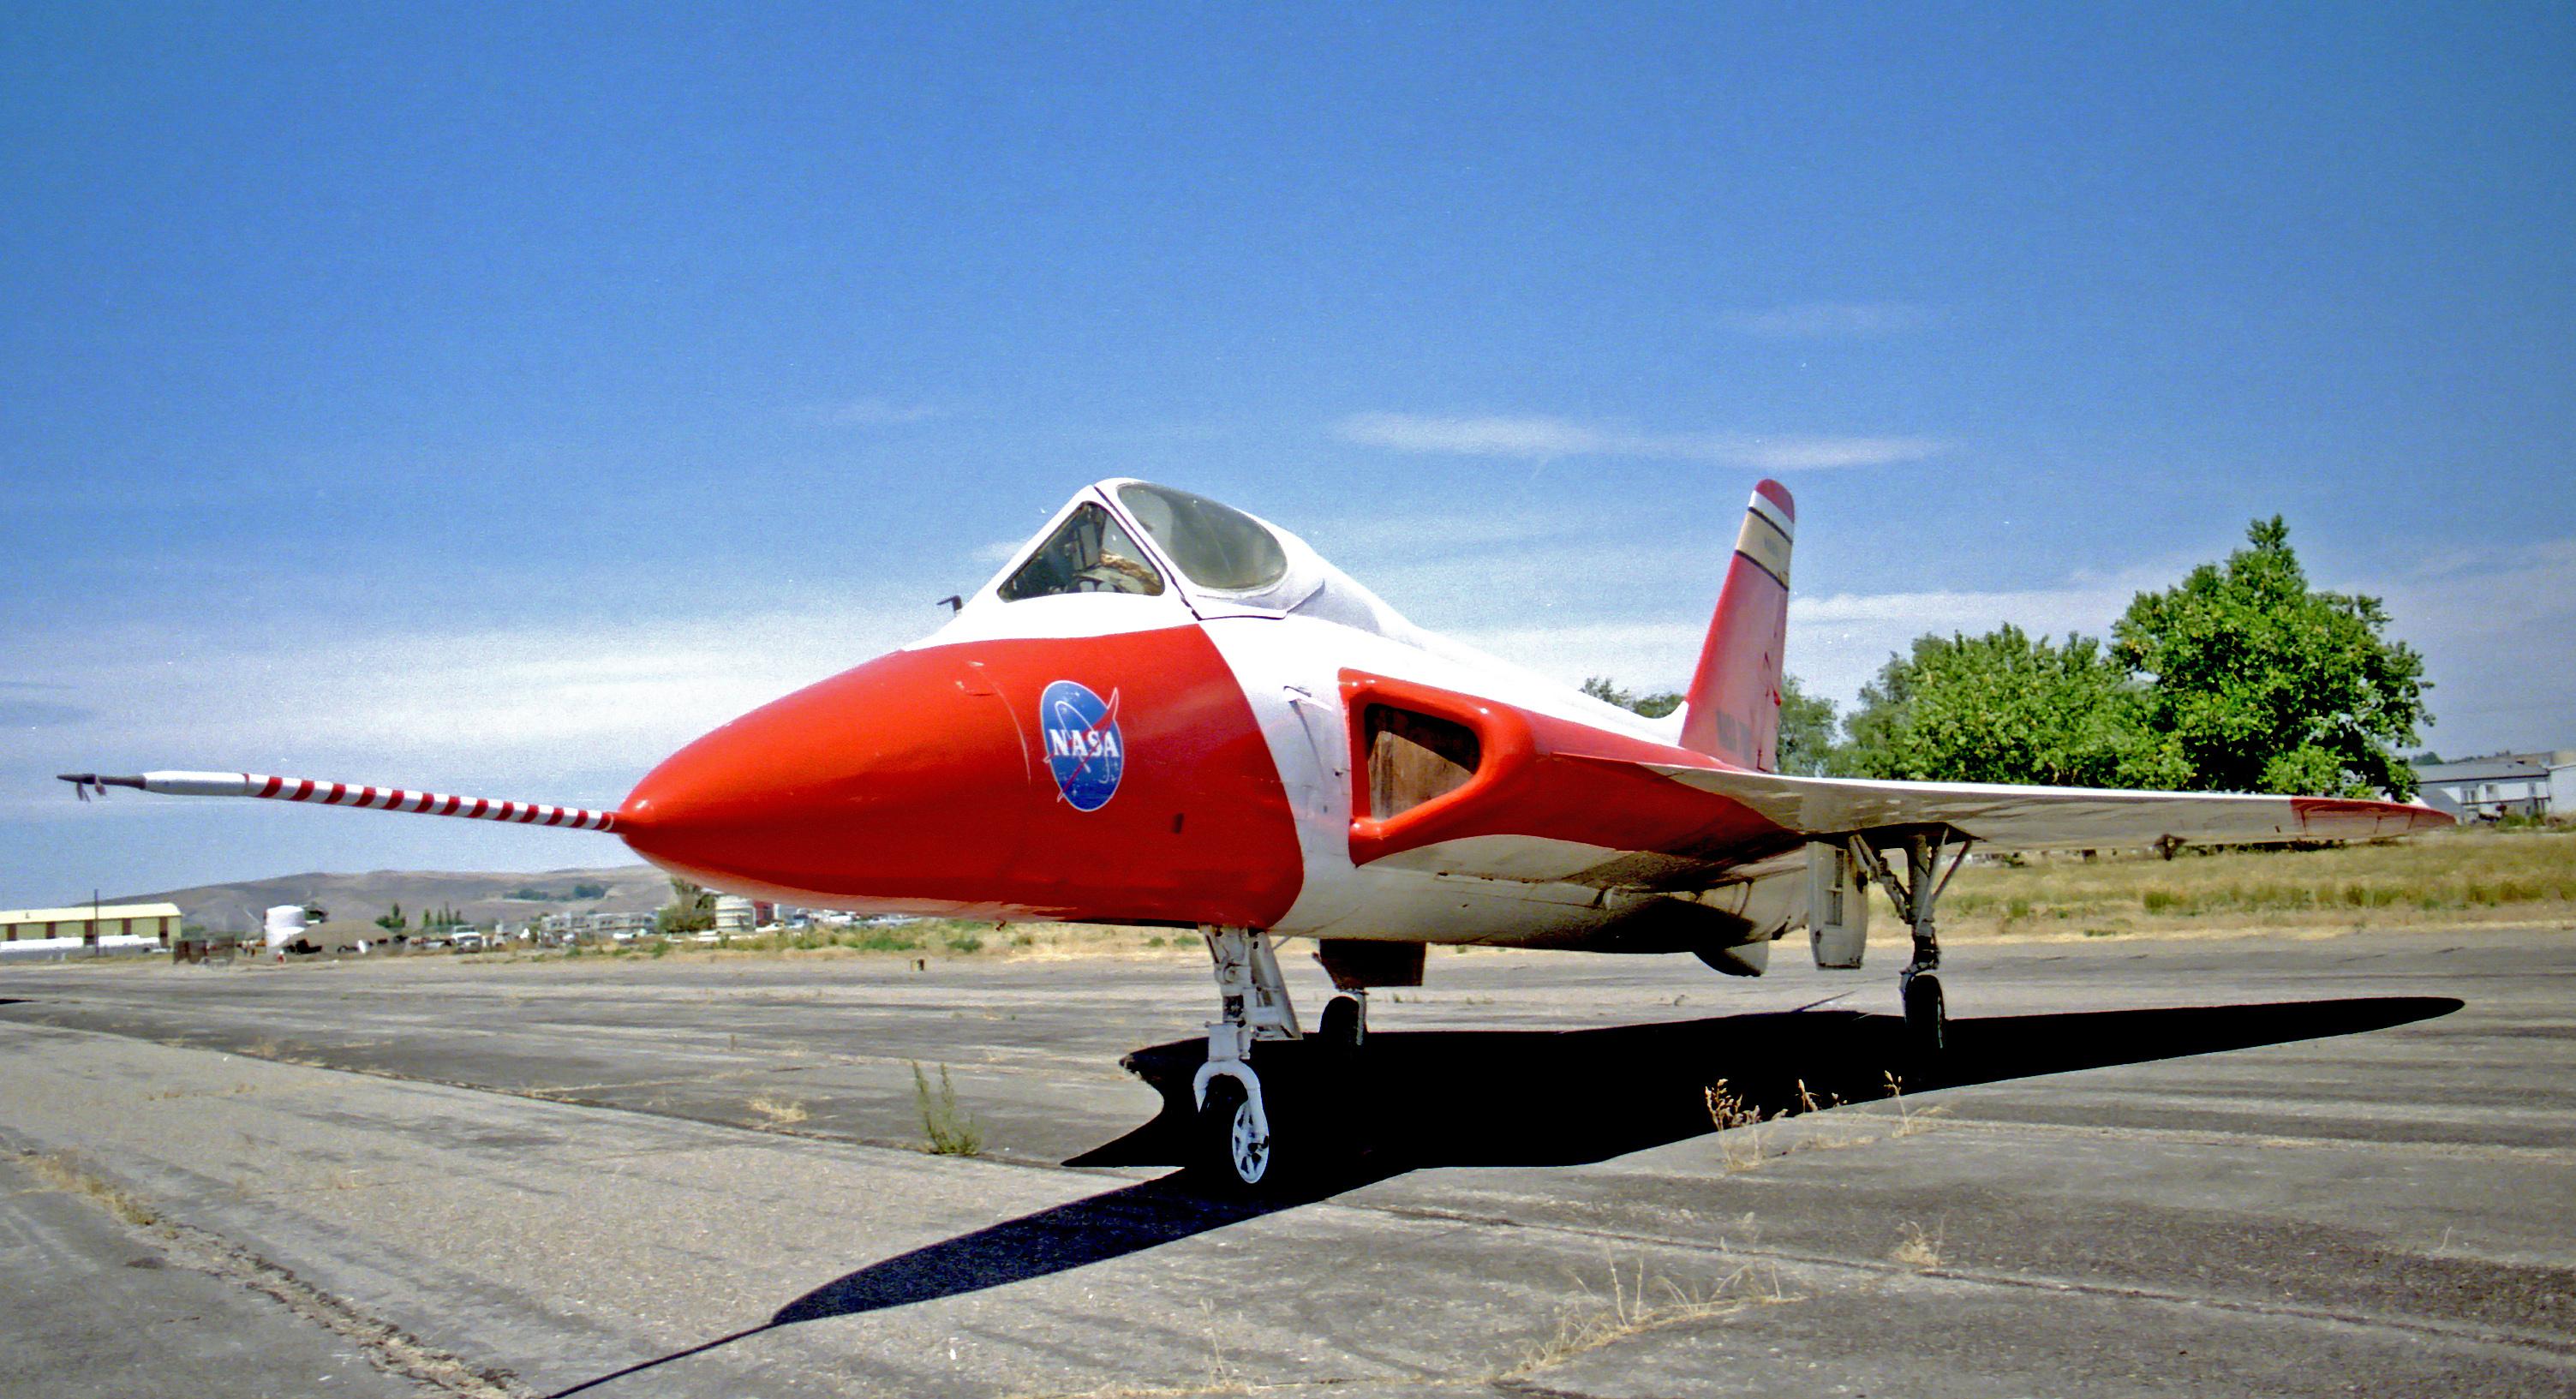 Description f5d 1 skylancer at ontario oregon municipal airport jpg